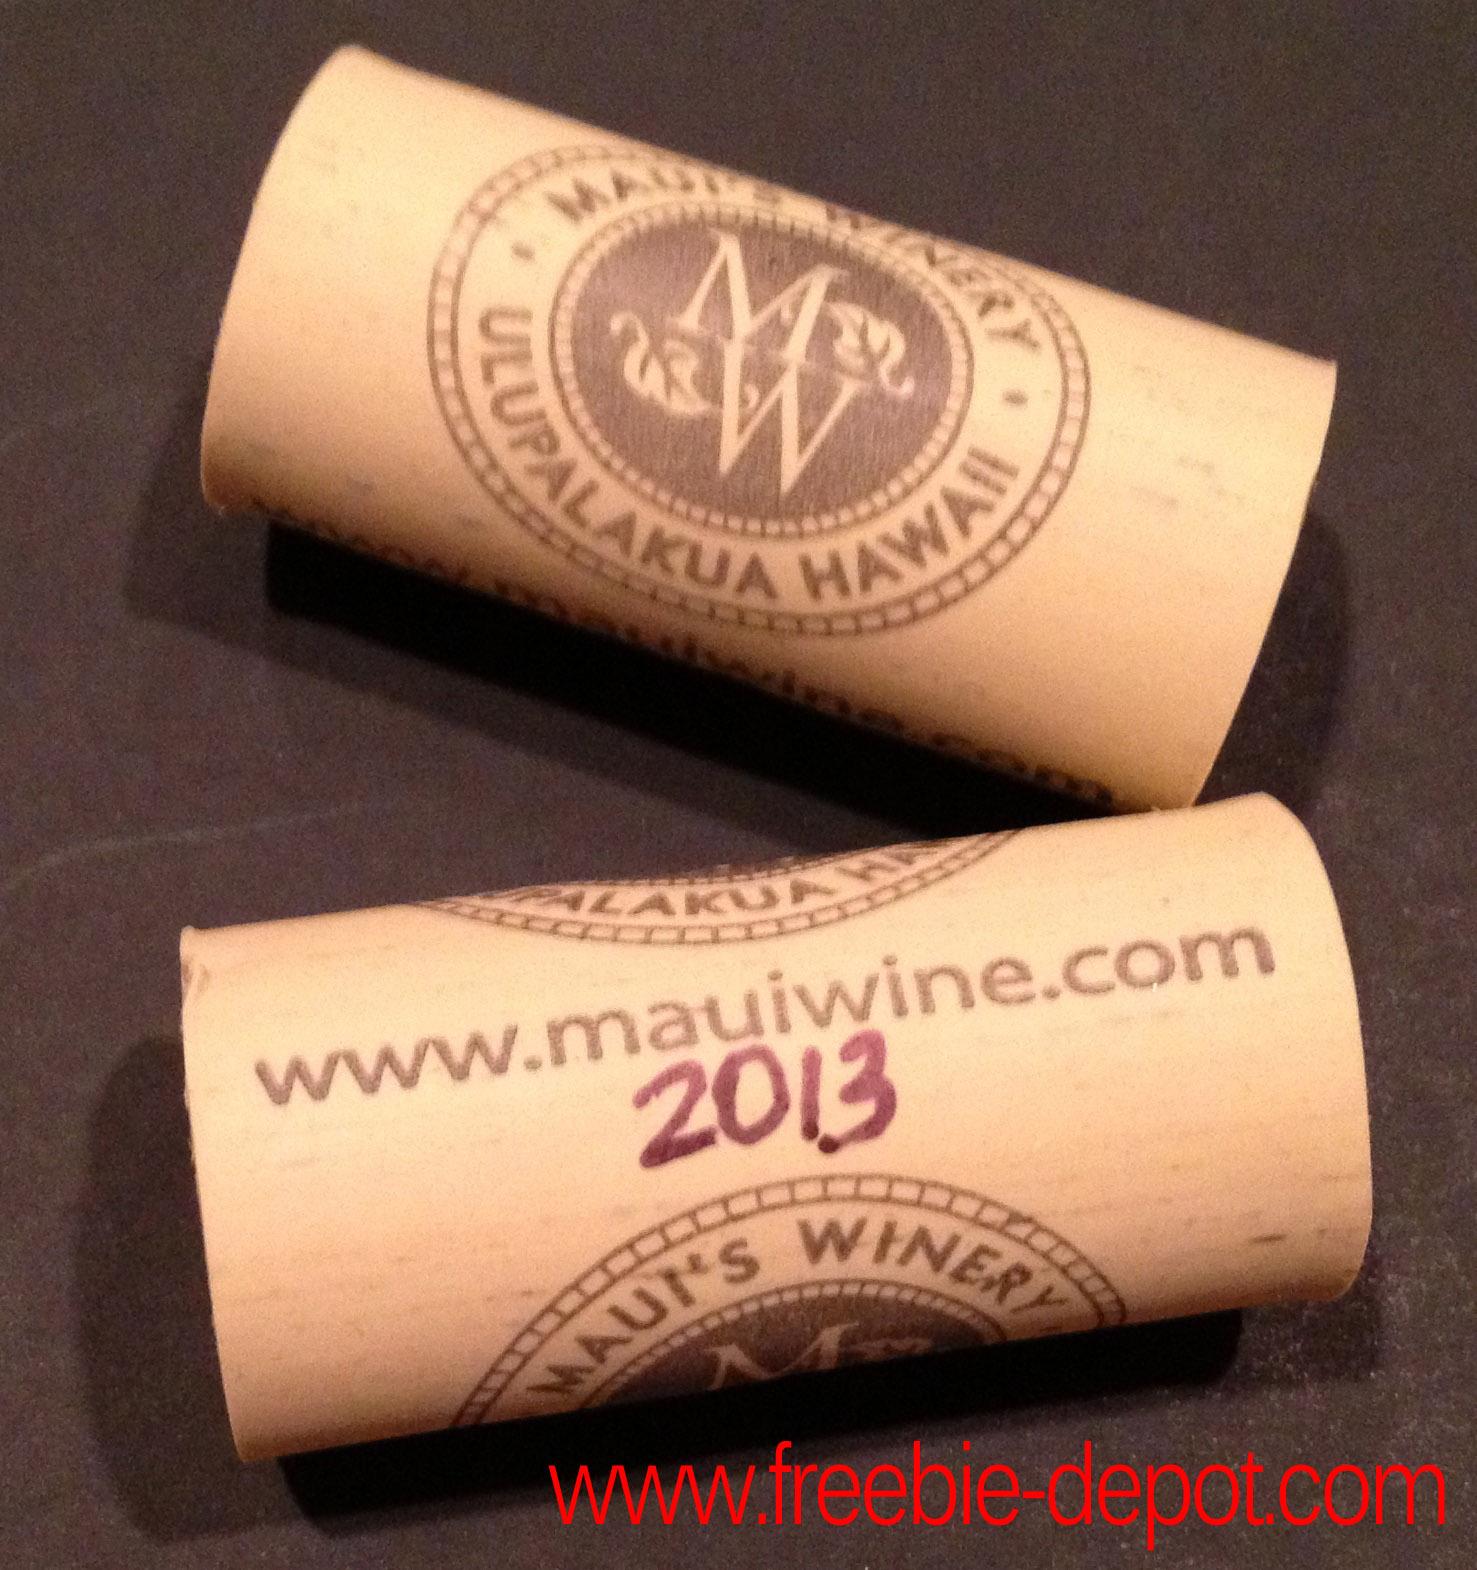 Free Maui Wine